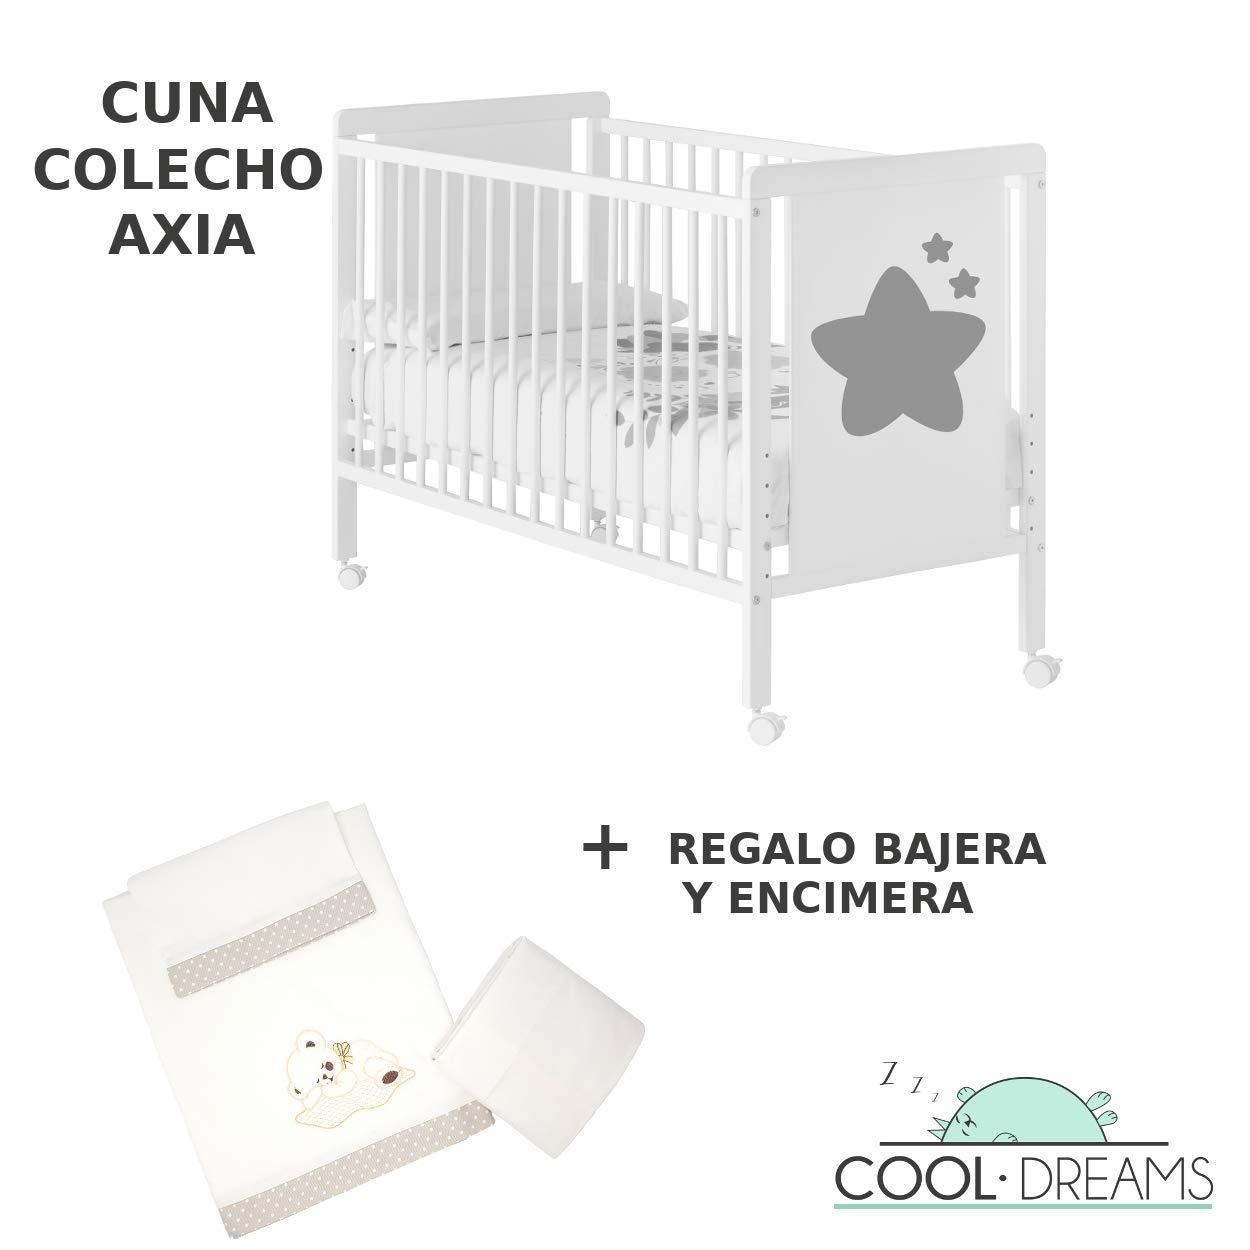 Cuna colecho Axia 120x60 + kit colecho + bajera + encimera Cool ...